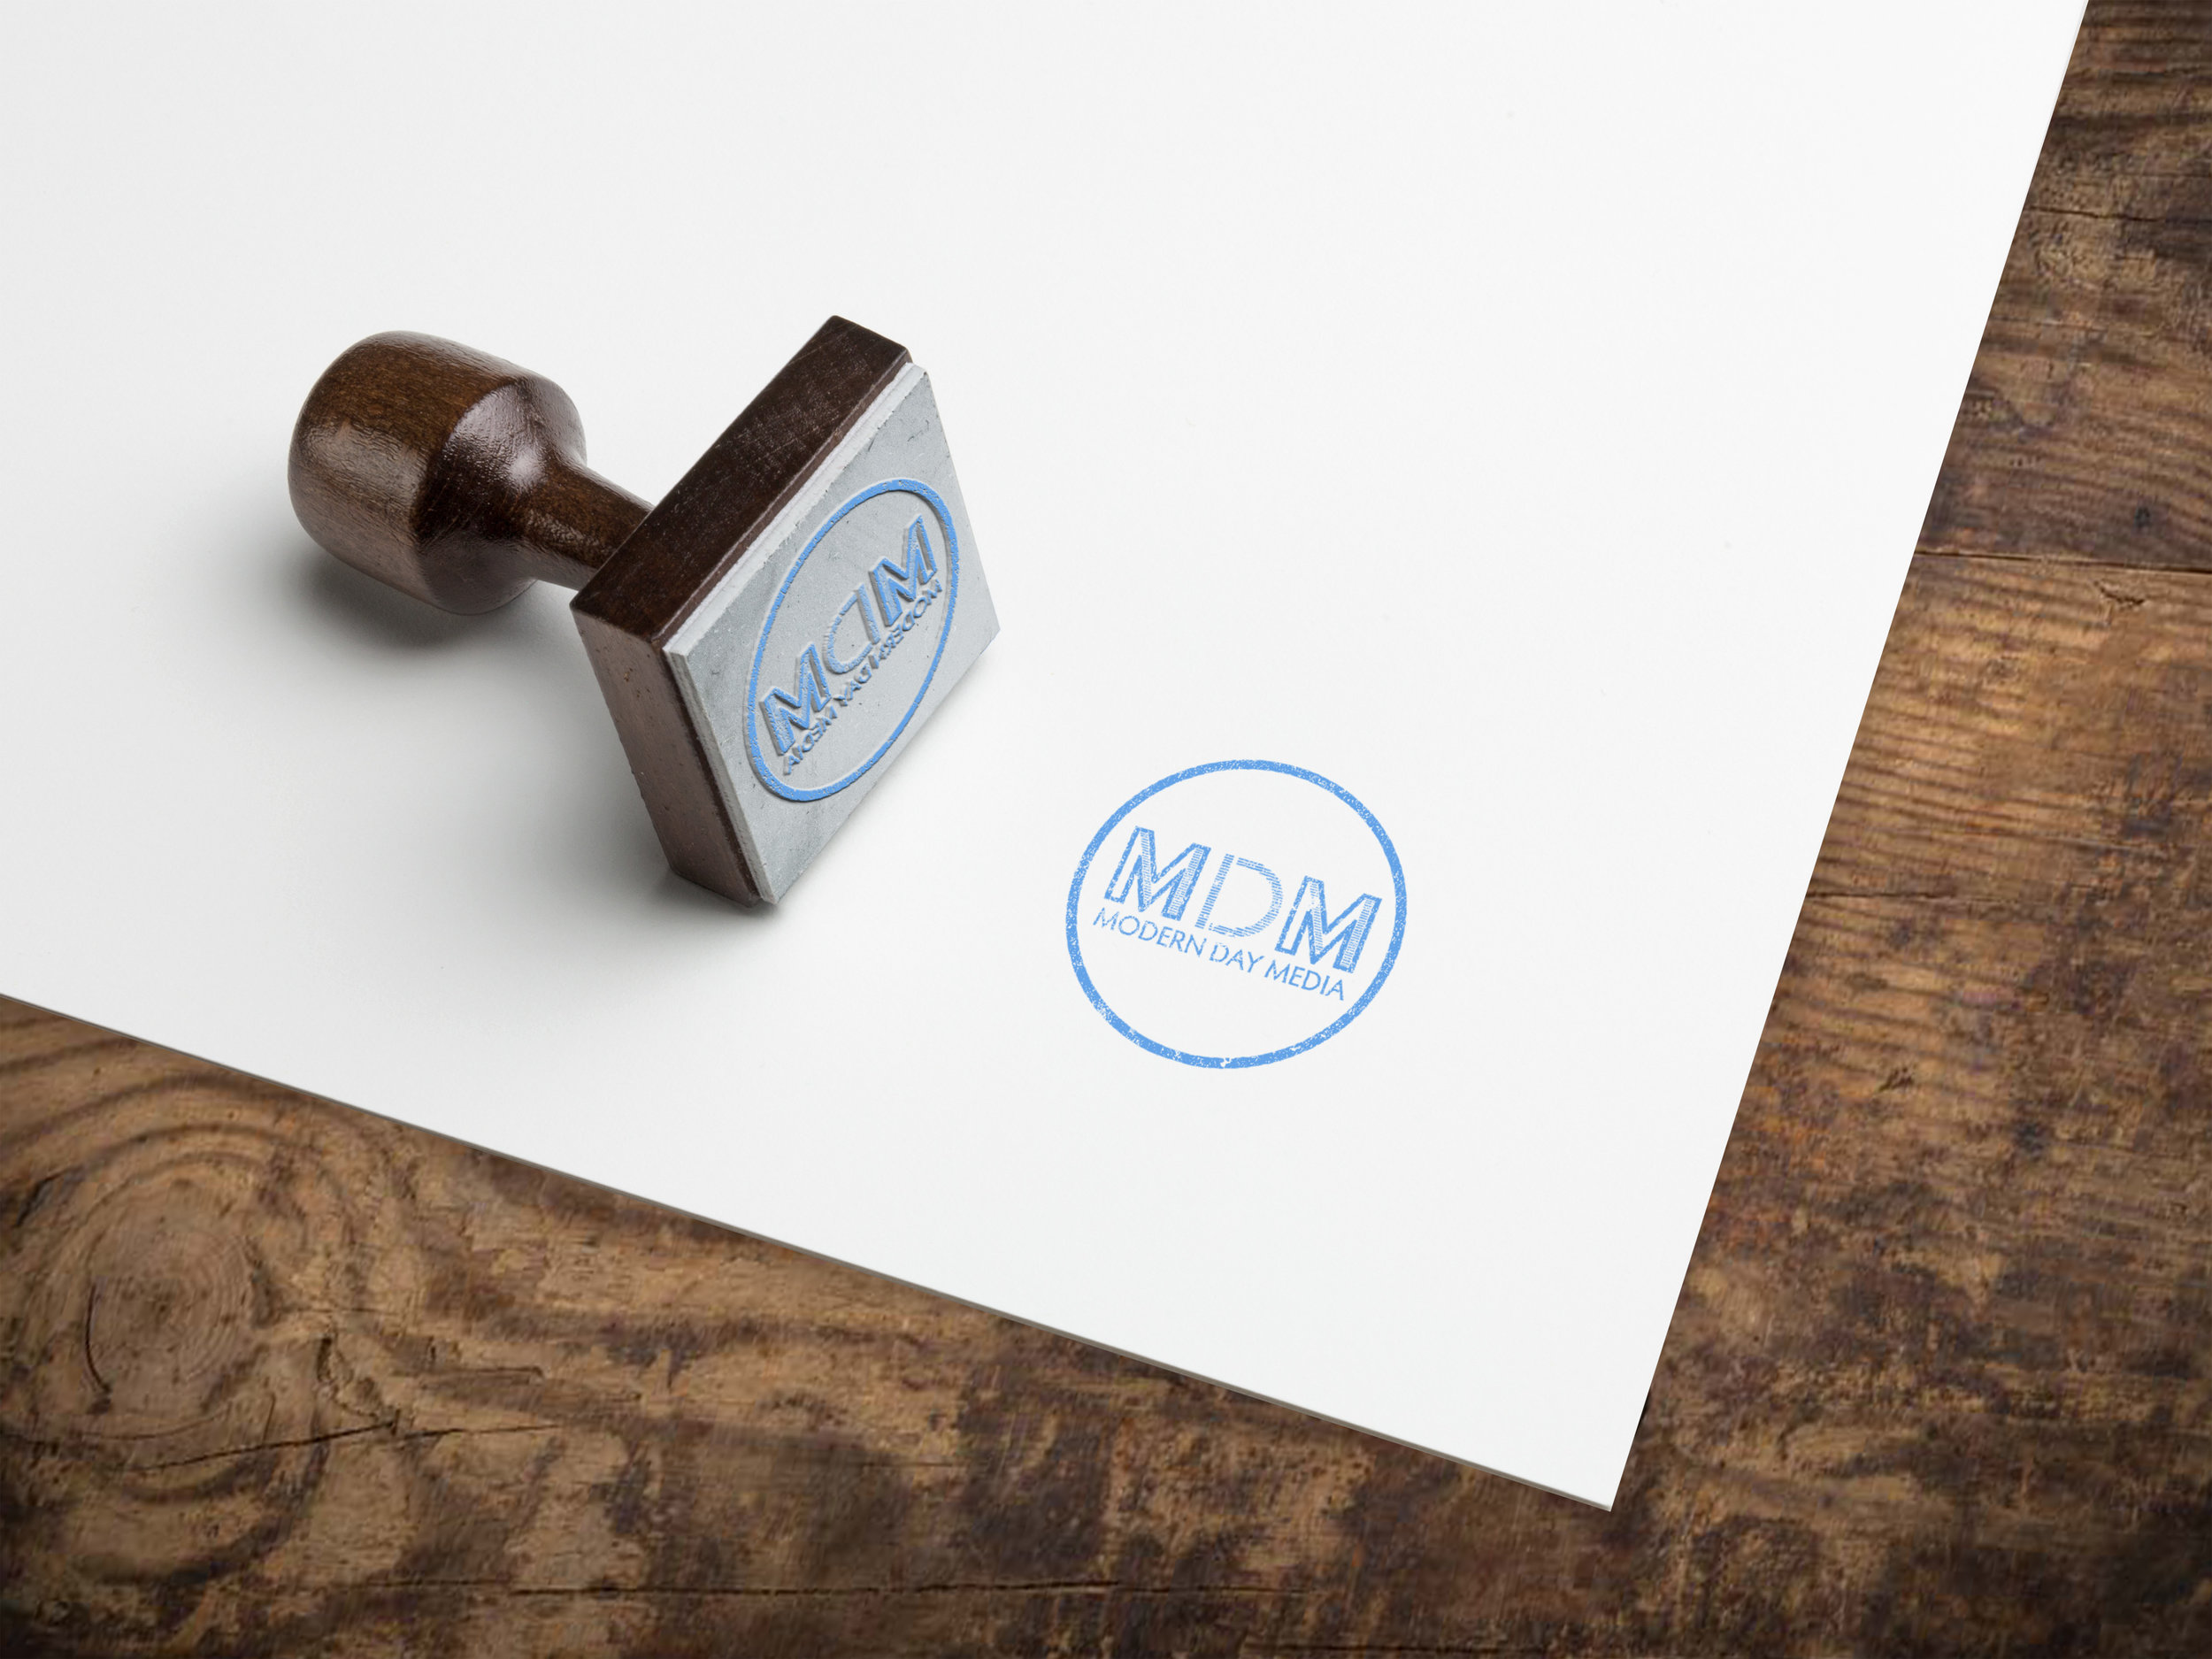 MDM-rubber-stamp.jpg